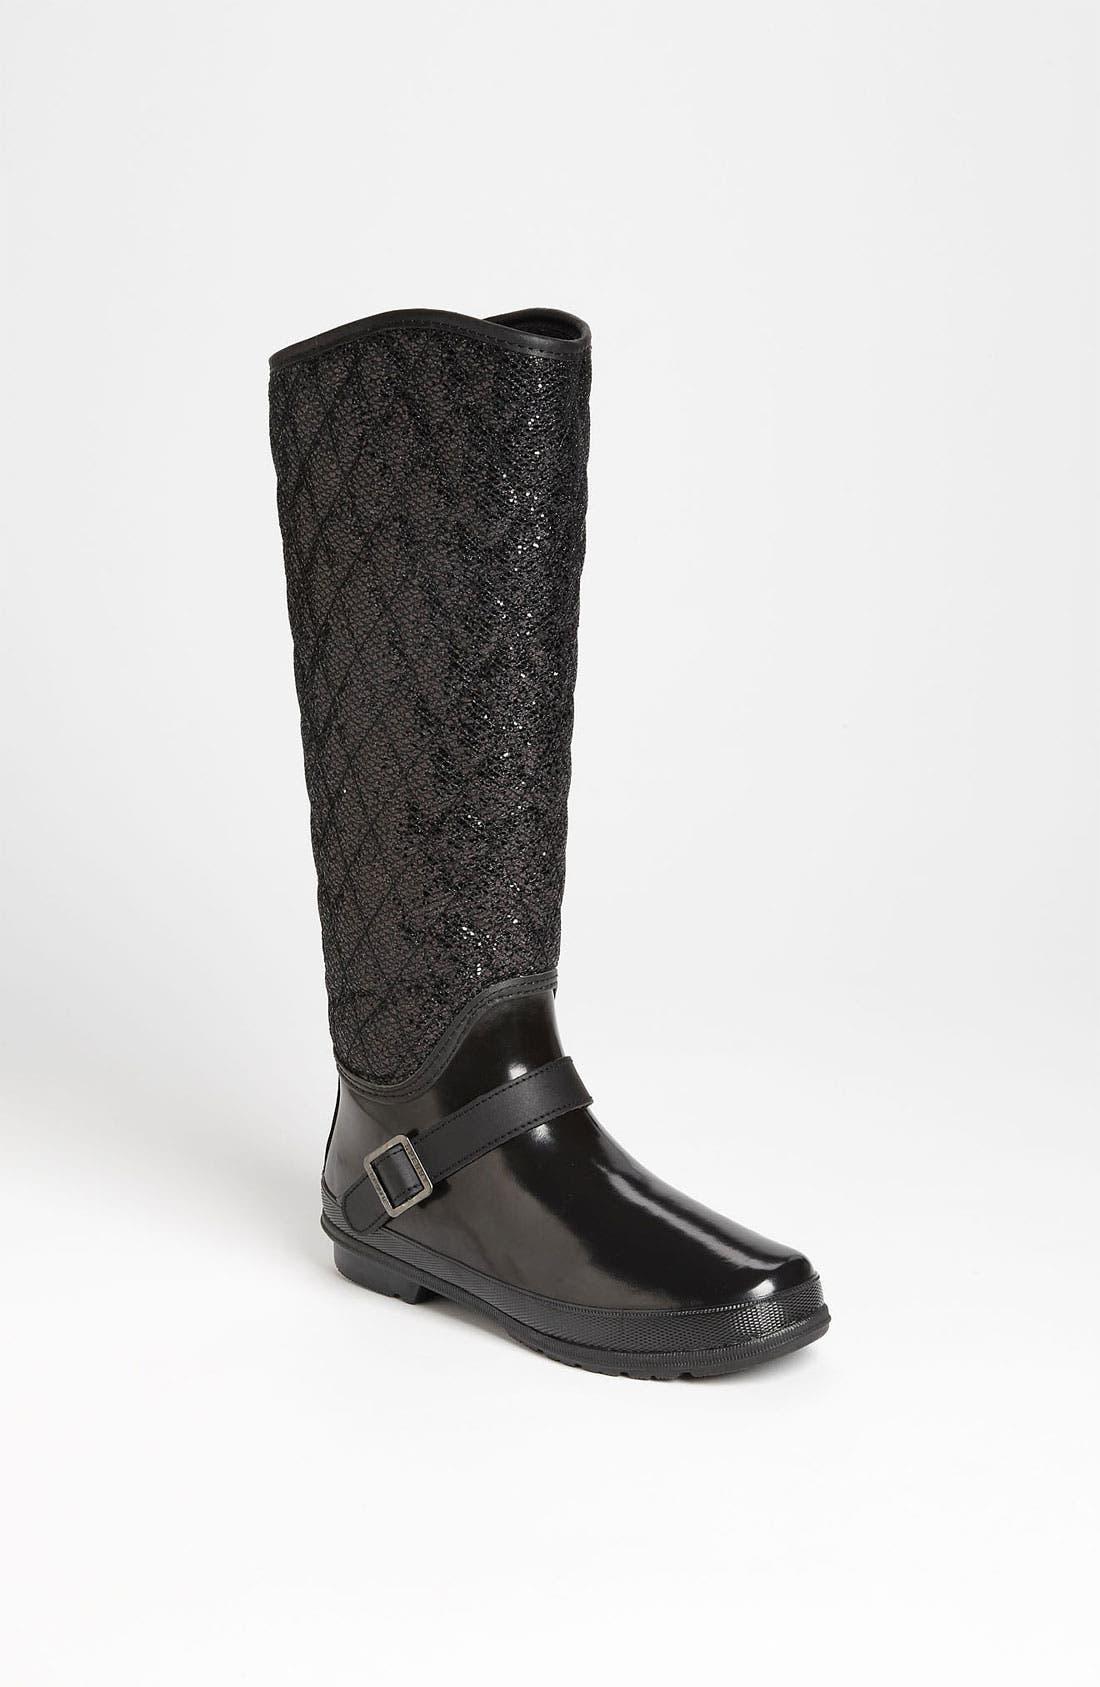 Main Image - Sperry Top-Sider® 'Hingham' Rain Boot (Women)